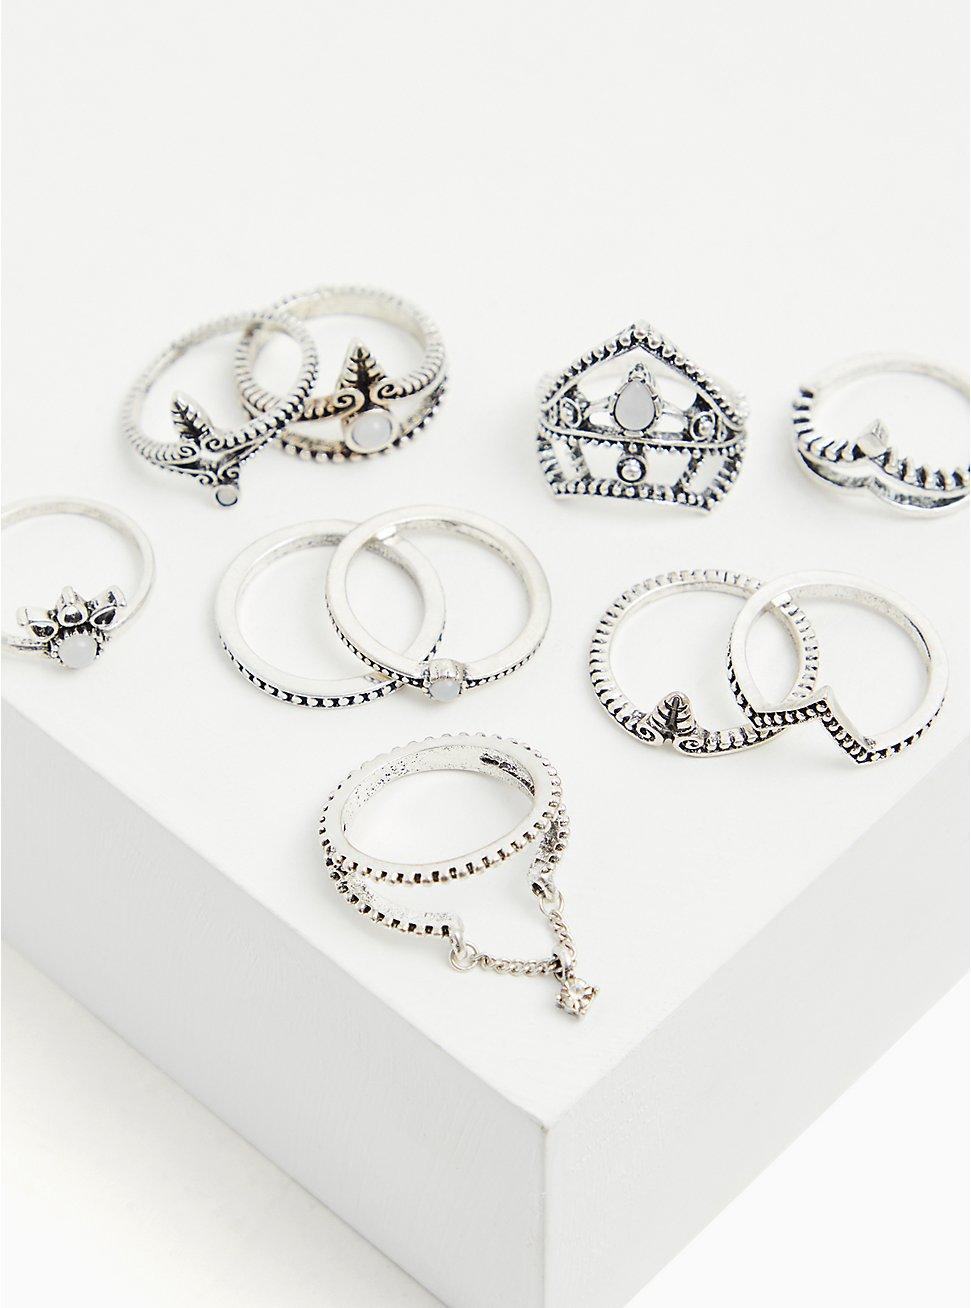 Silver-Tone Burnished Ring Set - Set of 10, SILVER, hi-res